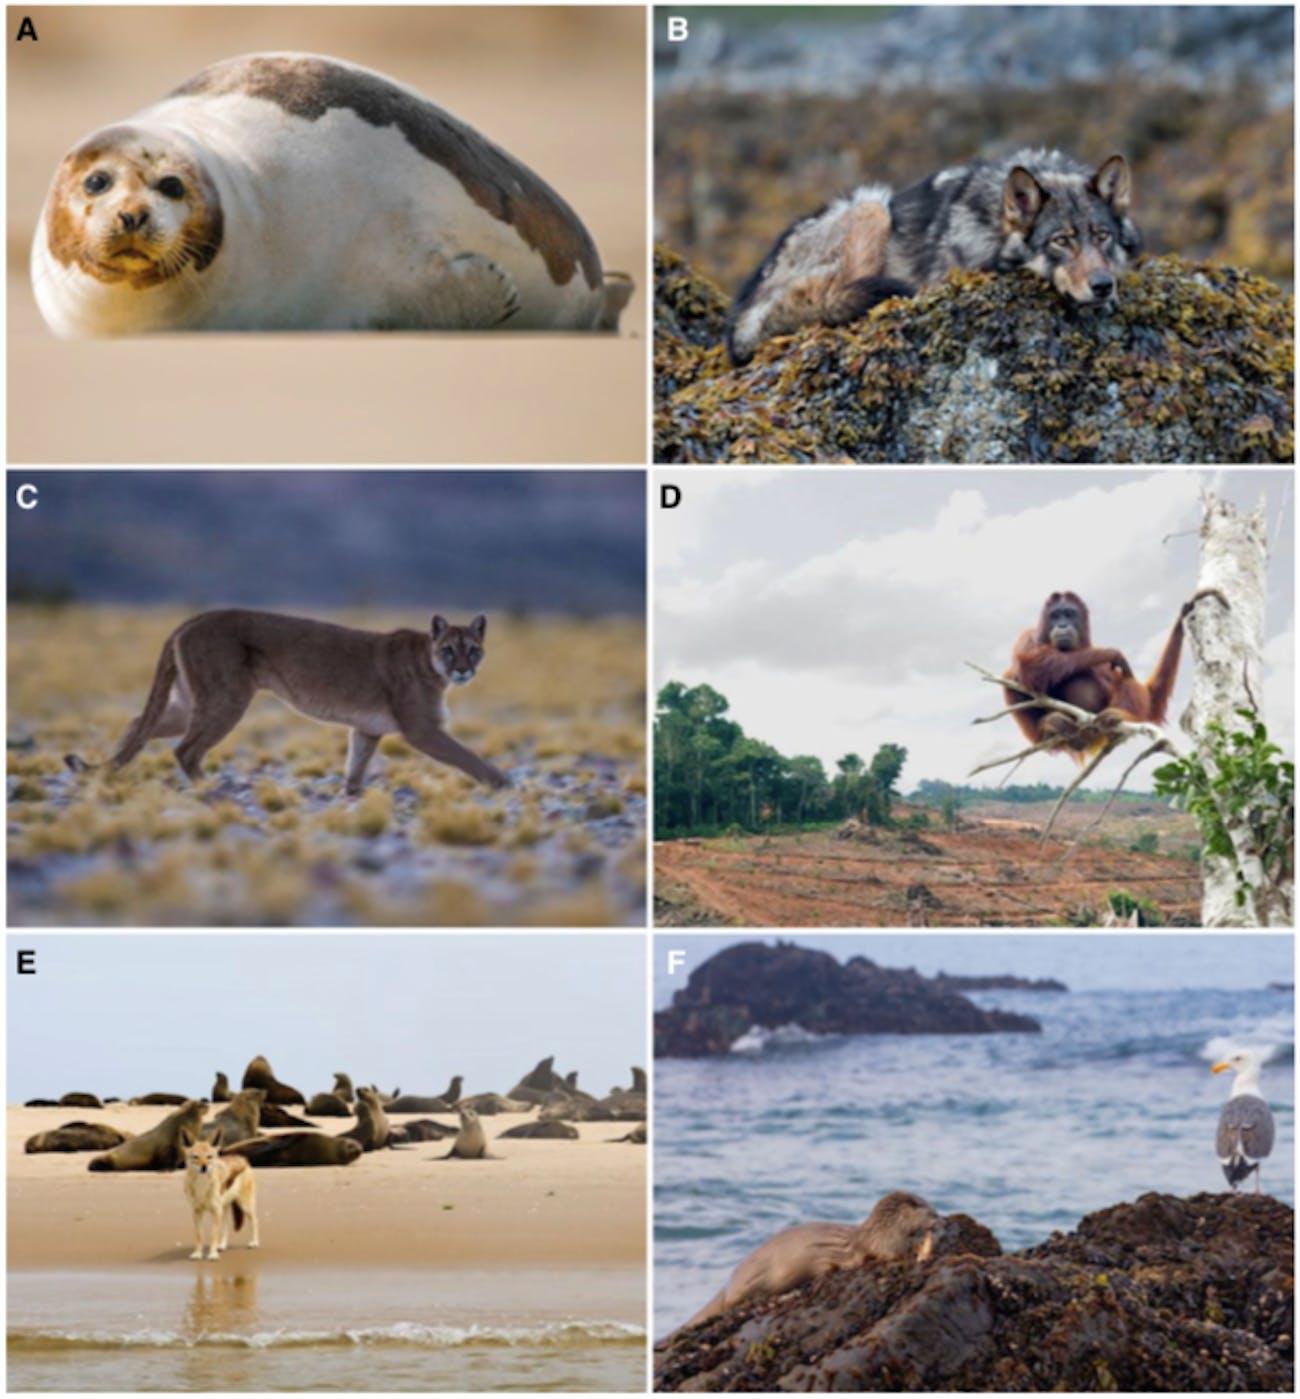 large-bodied predators in unexpected habitats